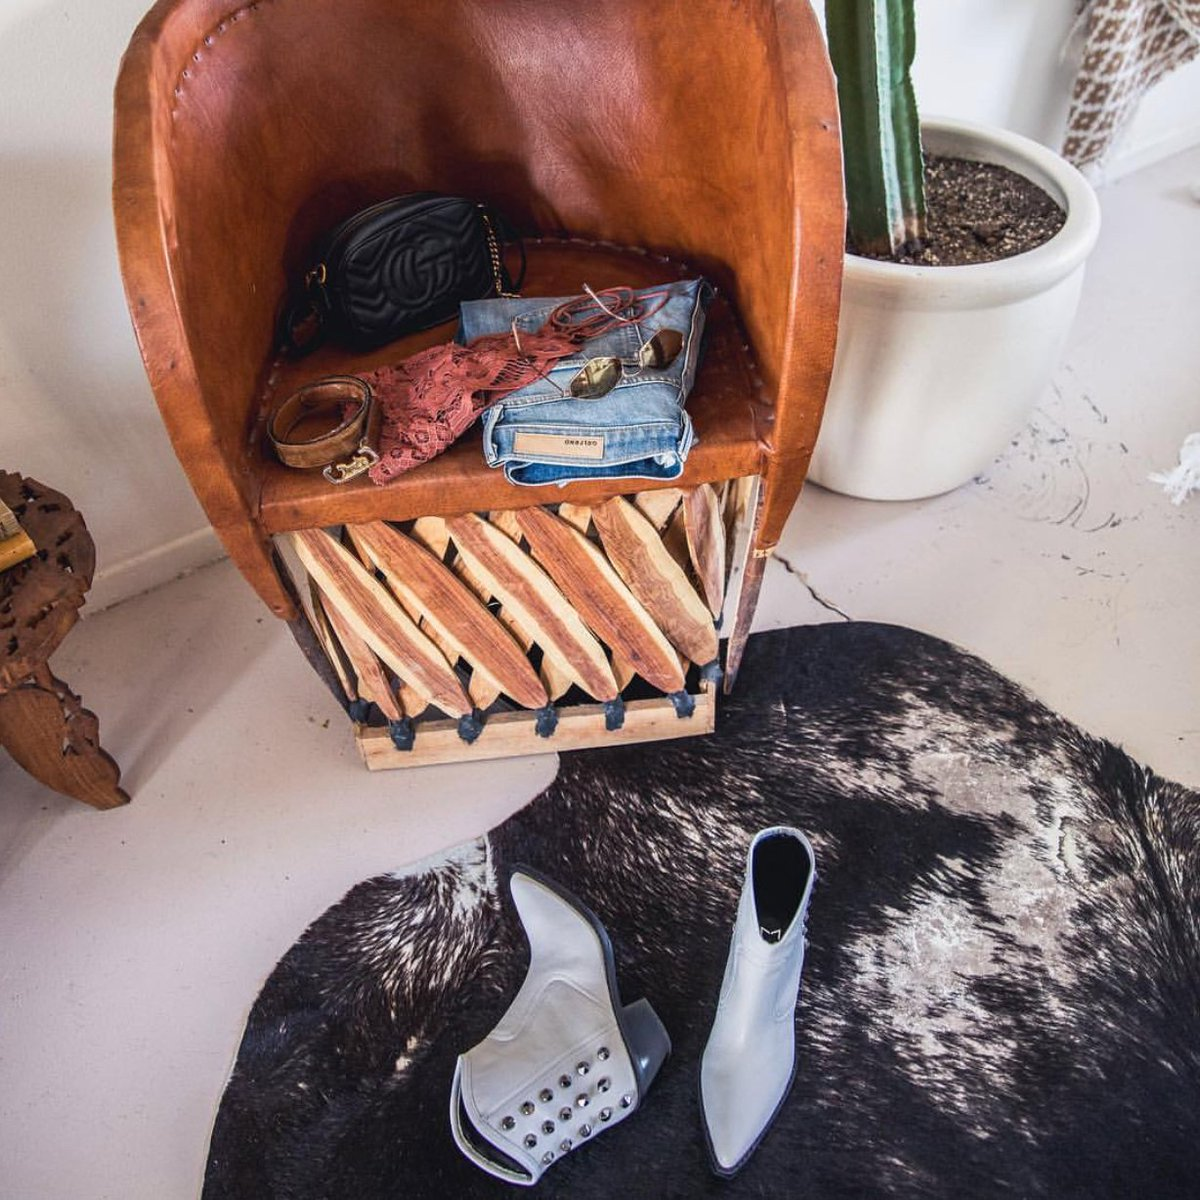 Weekends out west [Shoe: Baily] https://t.co/6NvYoV662B #MarcFisherLTD // @melaneeshale https://t.co/SPA5YtsWB5